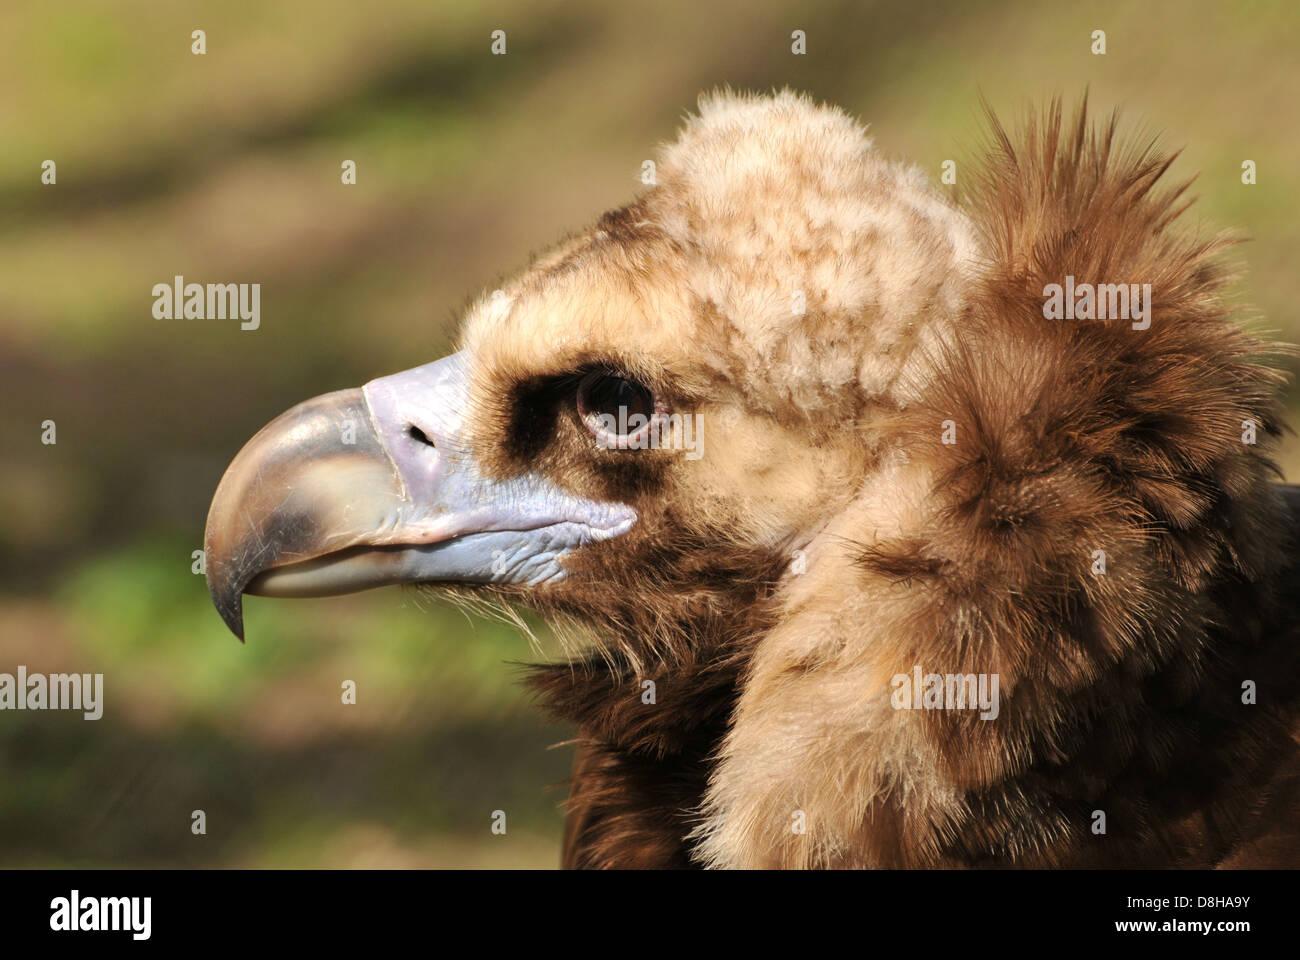 vulture's habit - Stock Image